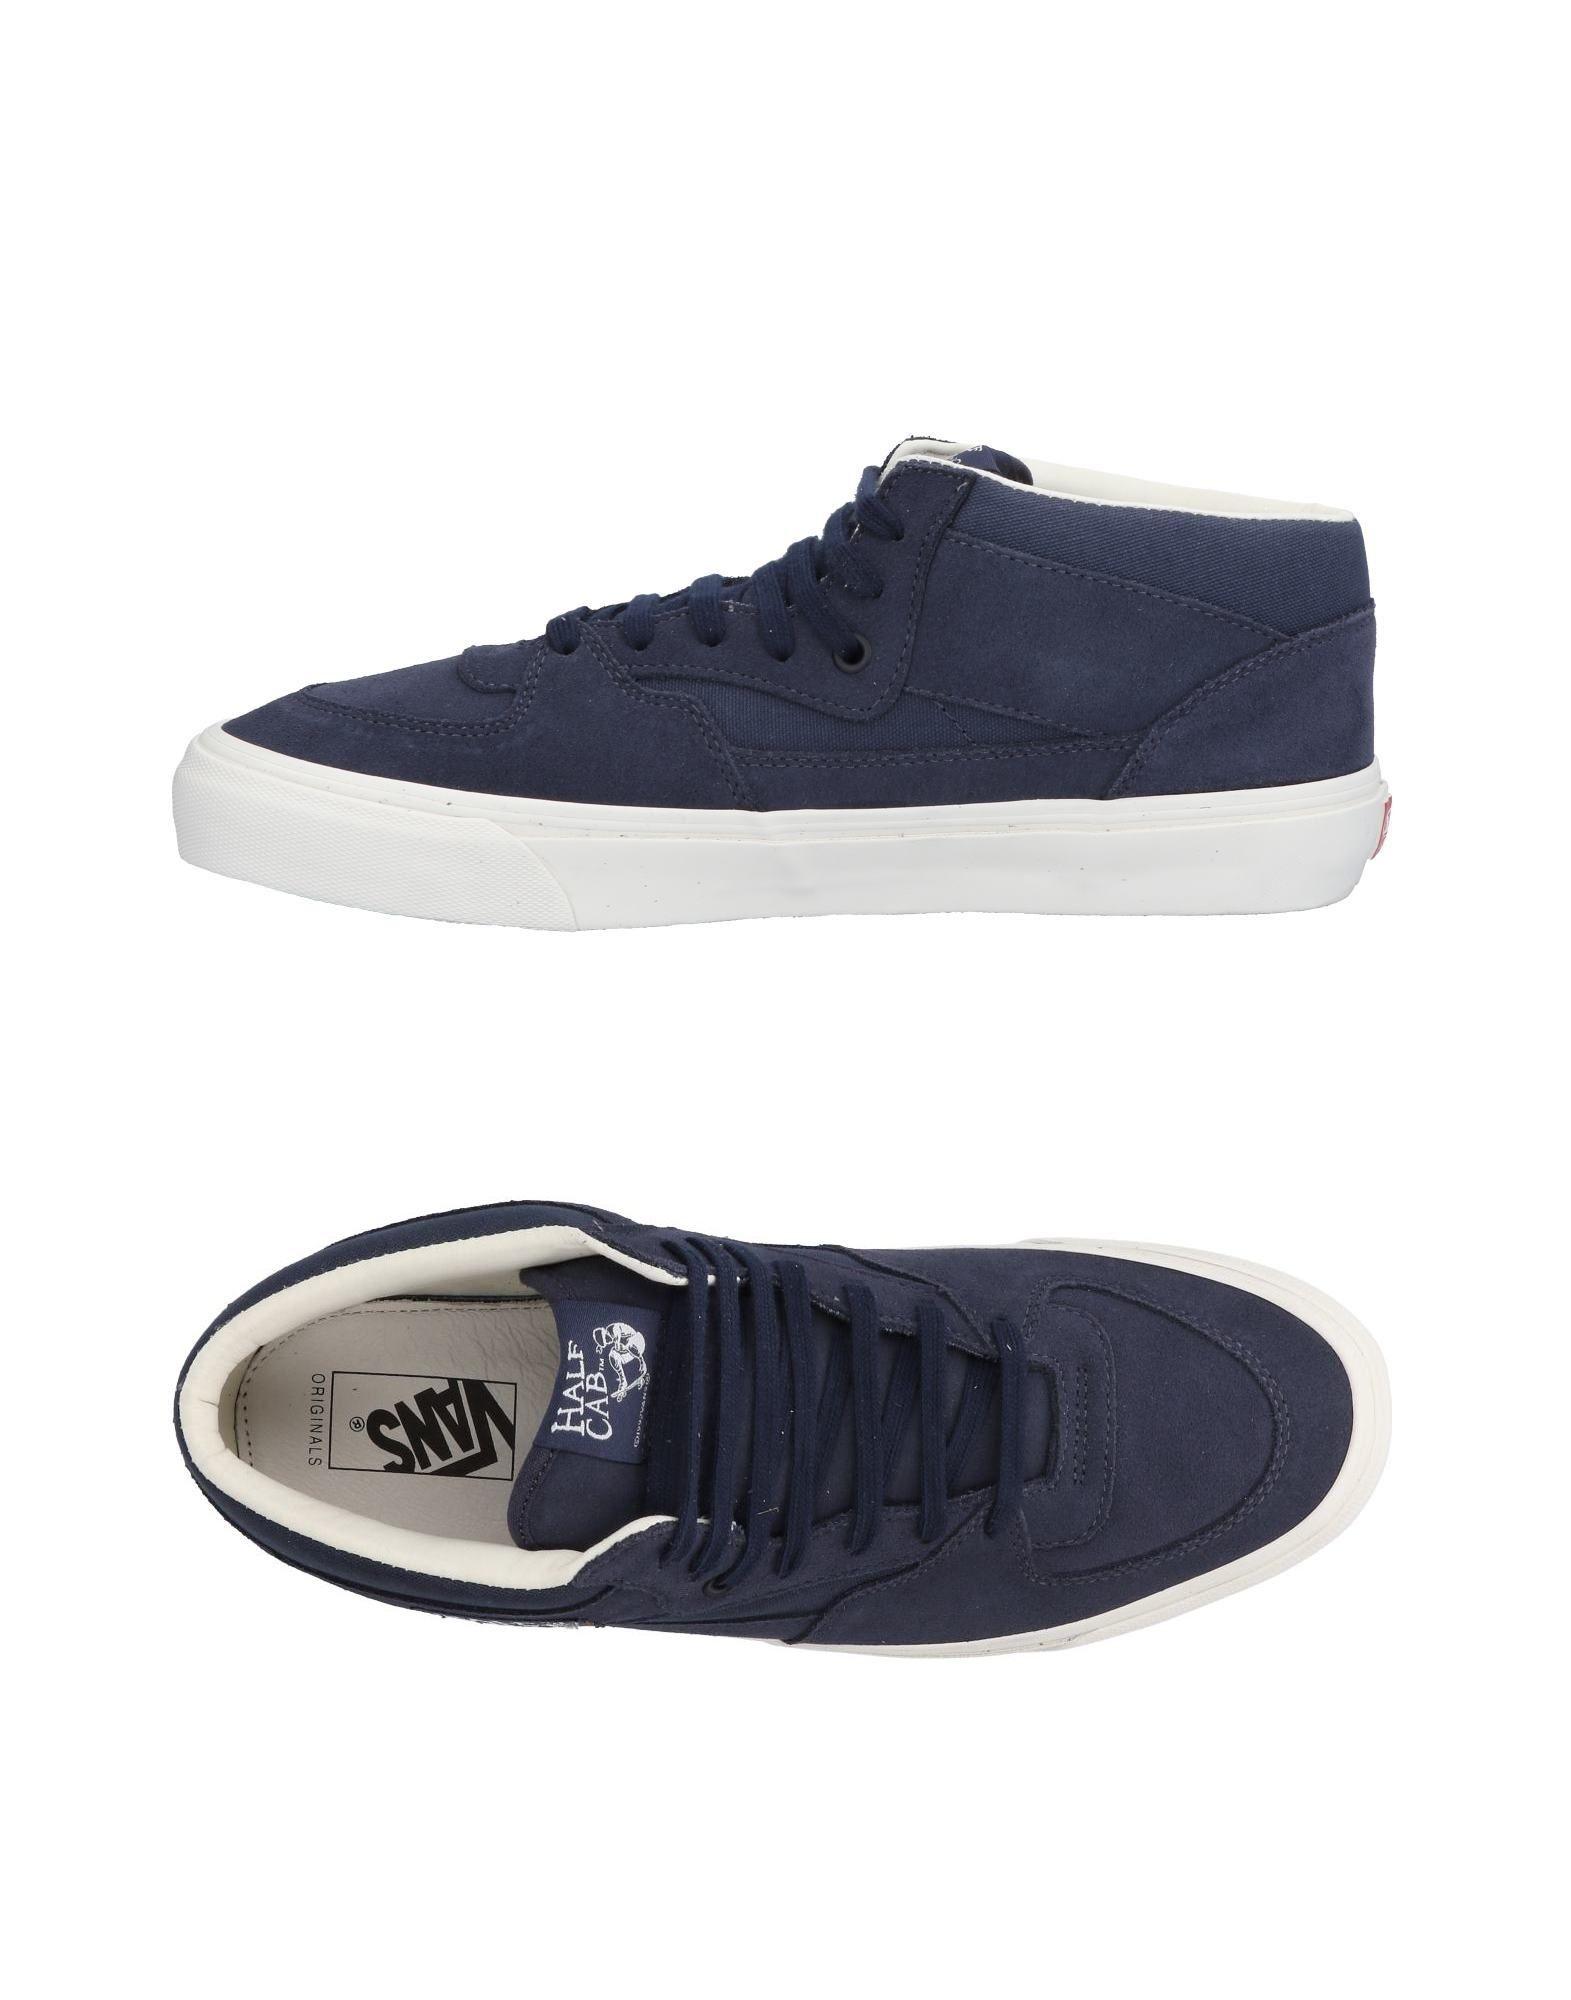 Moda Sneakers Vans Uomo - 11493407JI 11493407JI - eb8a12